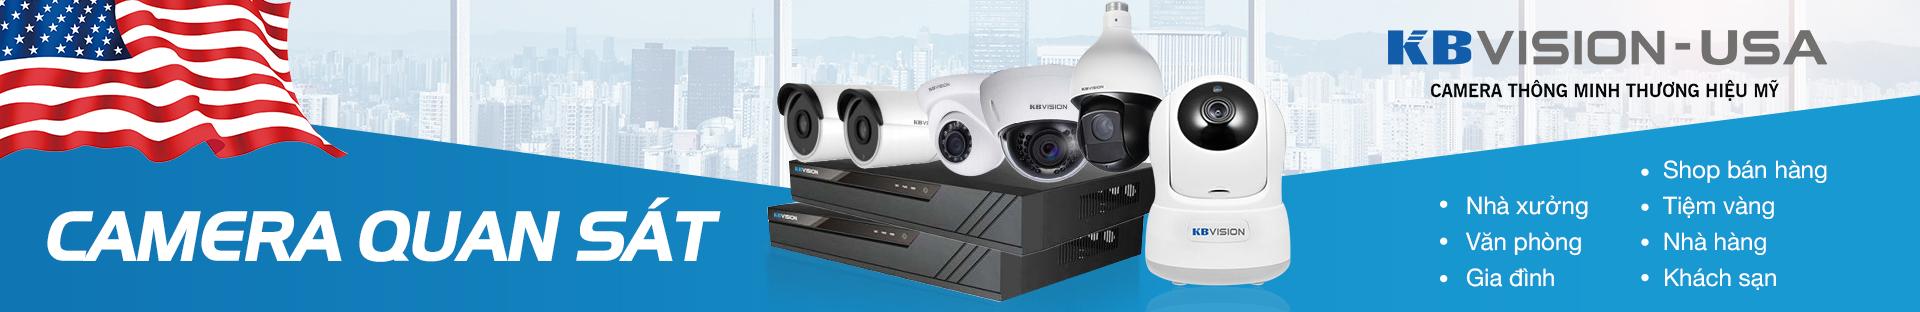 Bộ Camera KBVISION-USA